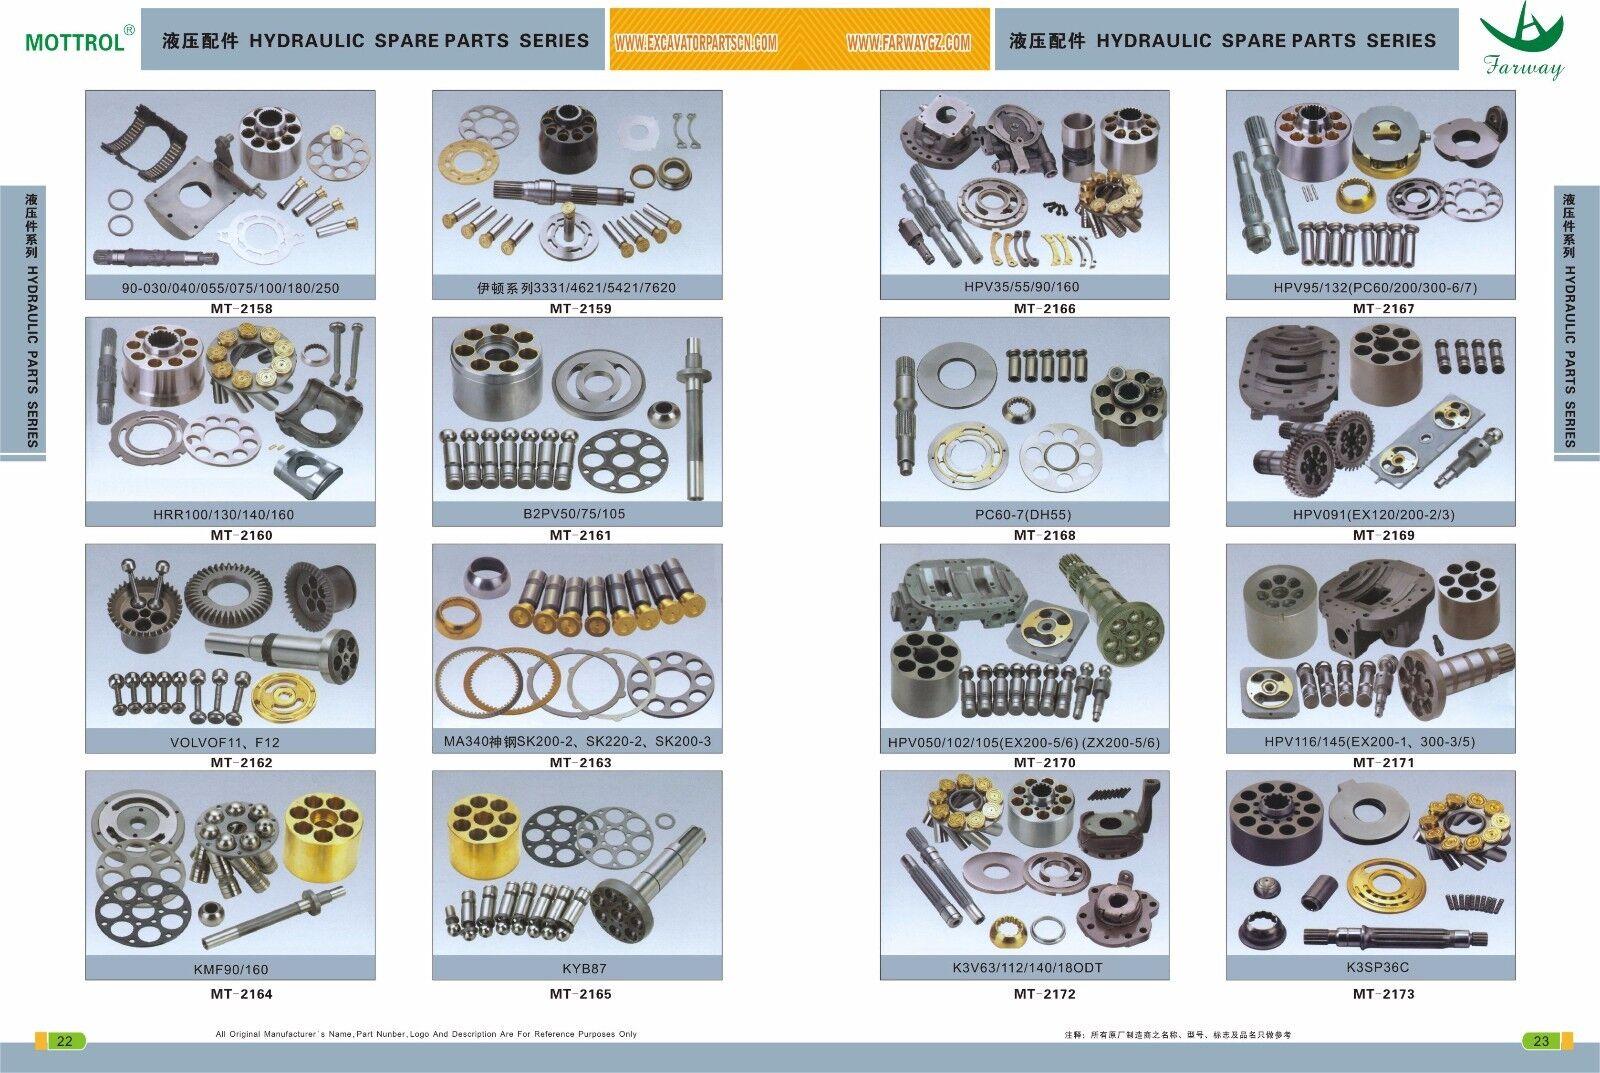 Window Lock Fits Komatsu Hitachi Catkobelcovolvojohn Deere Watlow Printed Circuit Board Heater Controller Assy 37550 102 Ebay 8 11